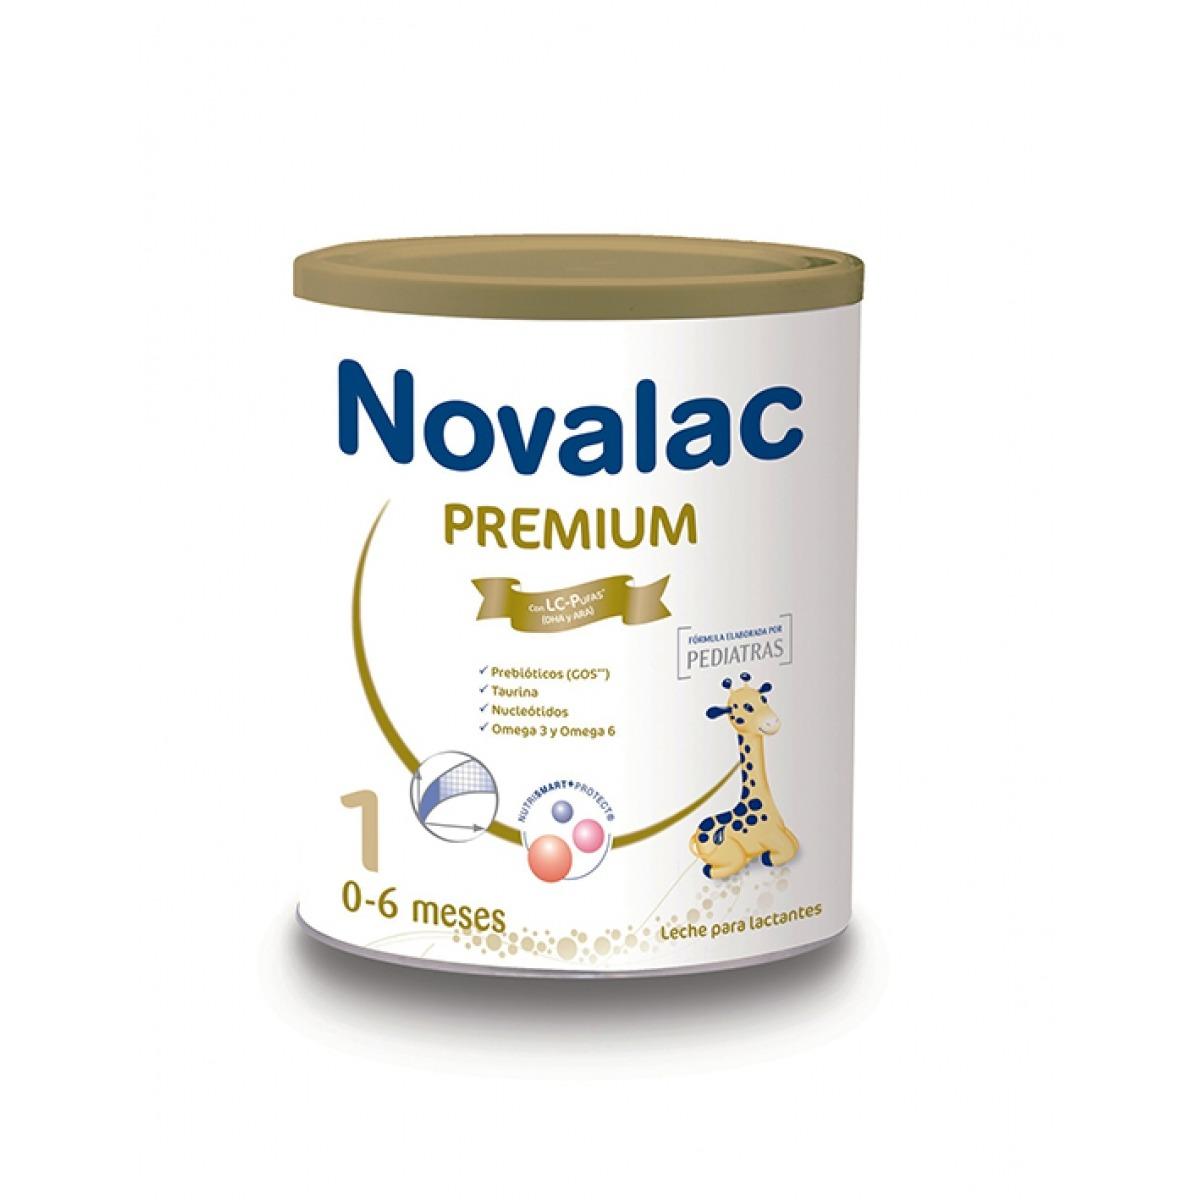 NOVALAC PREMIUM 1 LECHE DE INICIO 800 G.